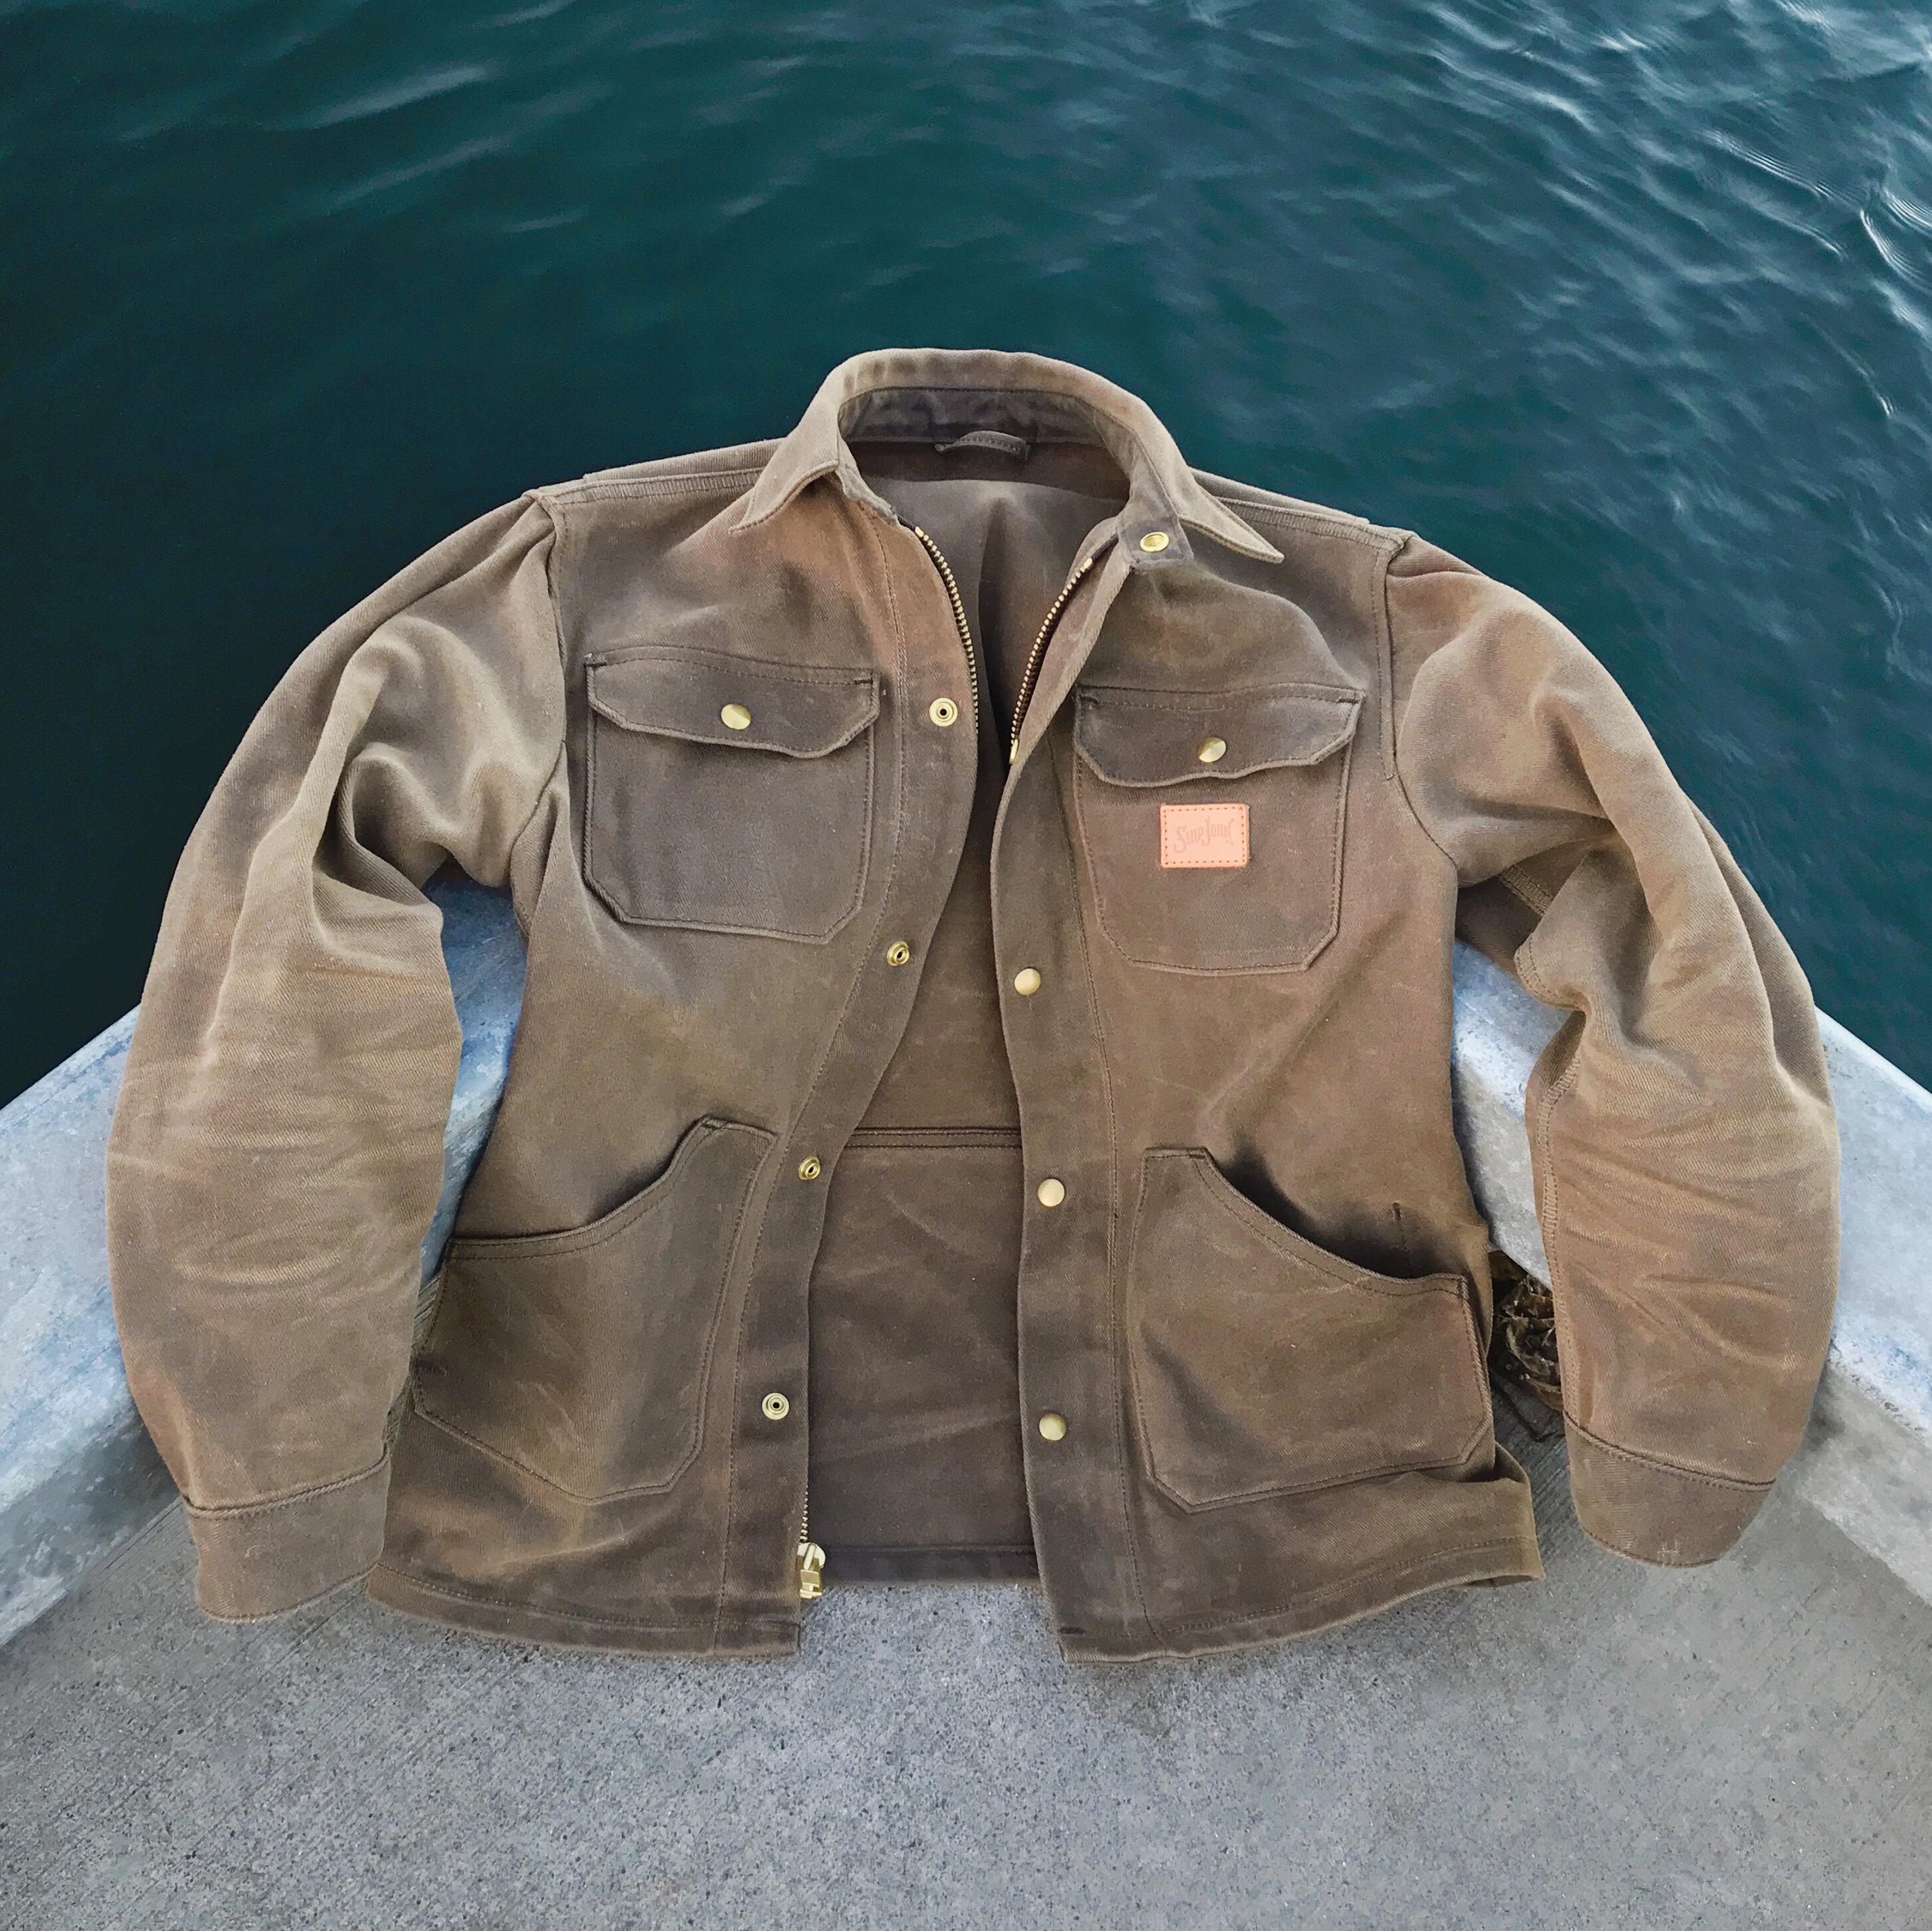 The Wills Jacket